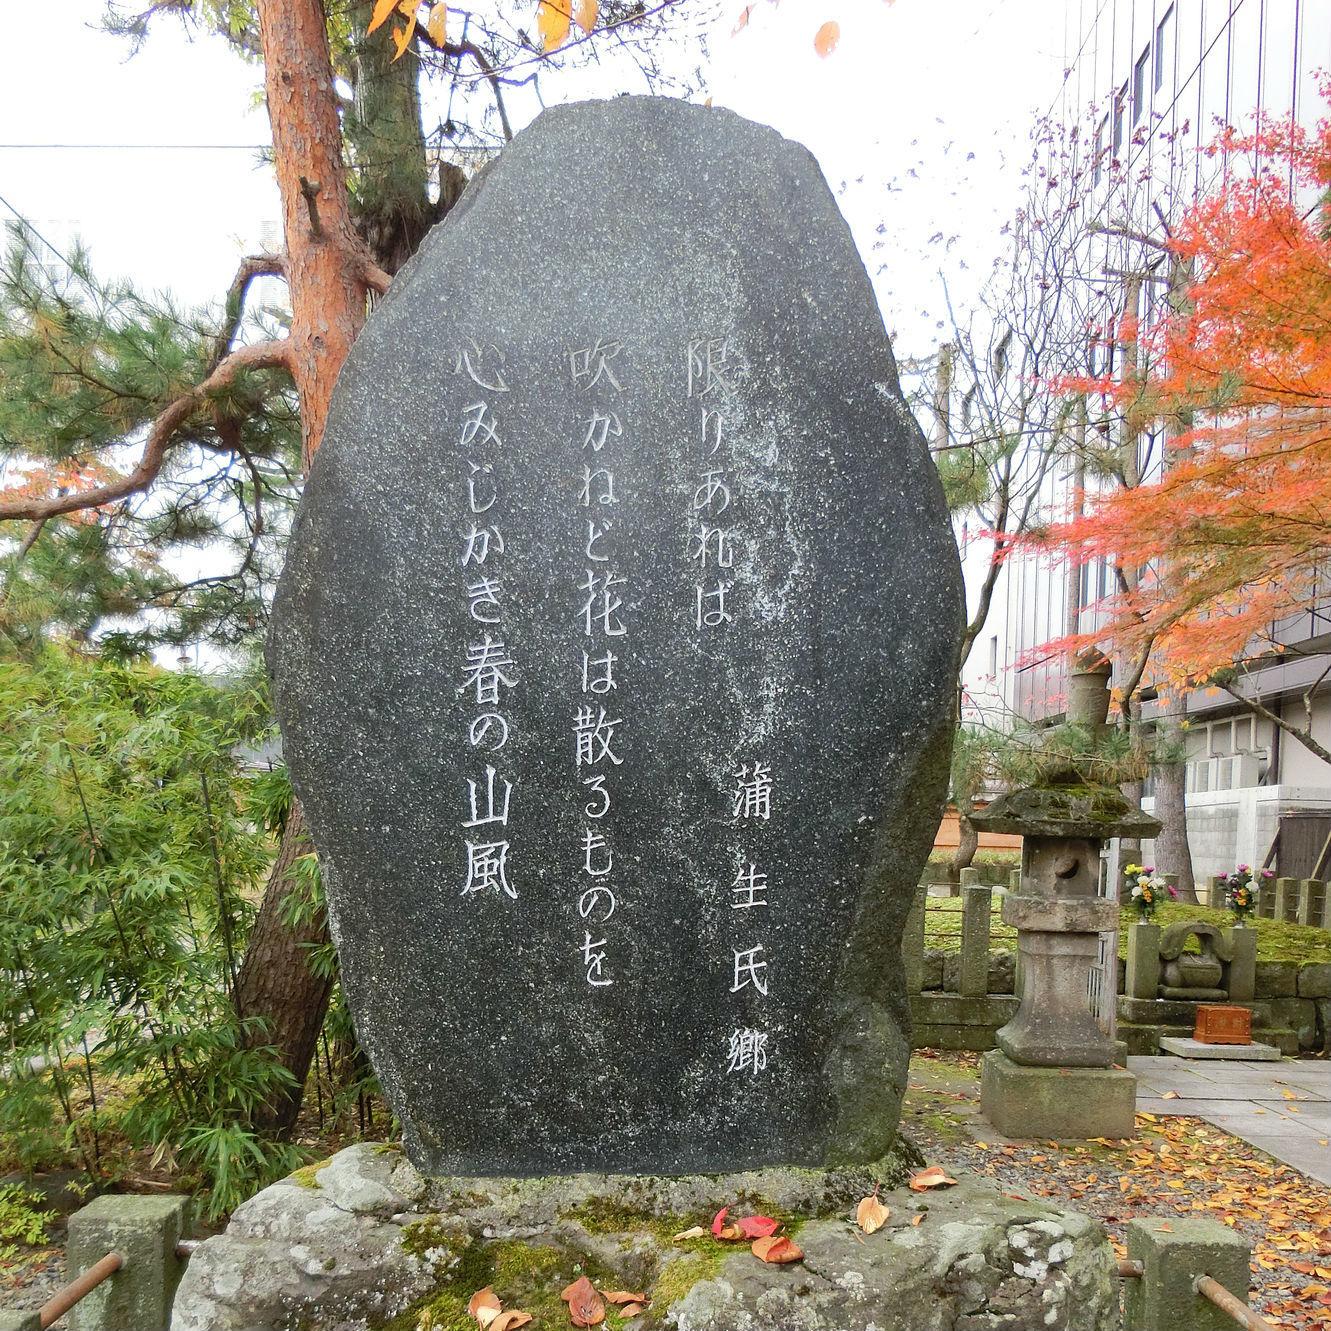 熊本の雄・加藤清正 家康会見後の不審死